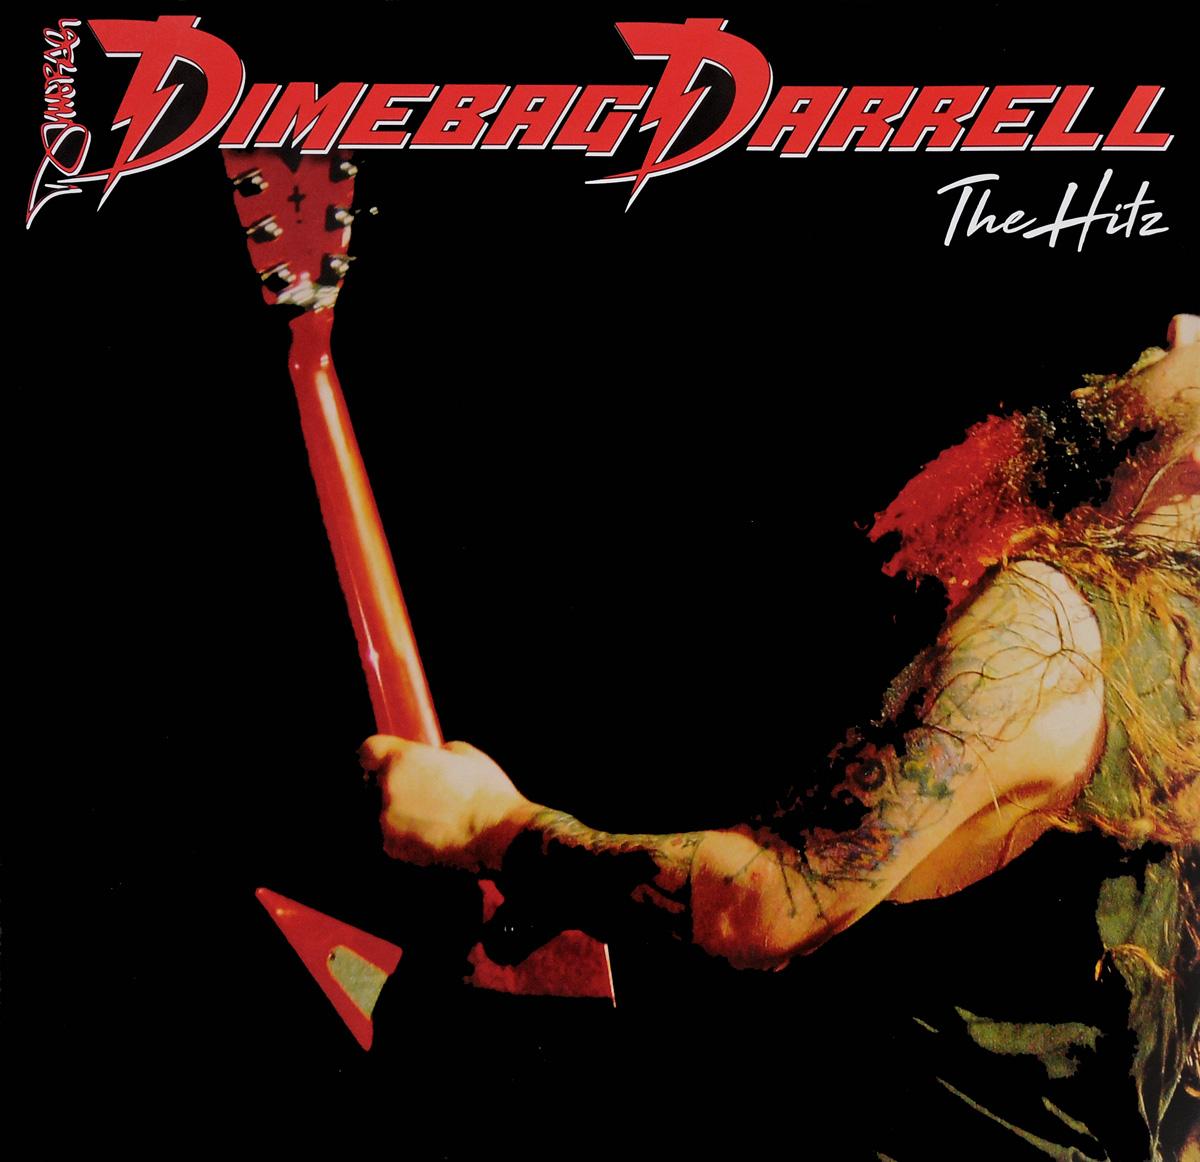 Dimebag Darrell Dimebag Darrell. The Hitz (LP) dimebag darrell dimebag darrell the hitz